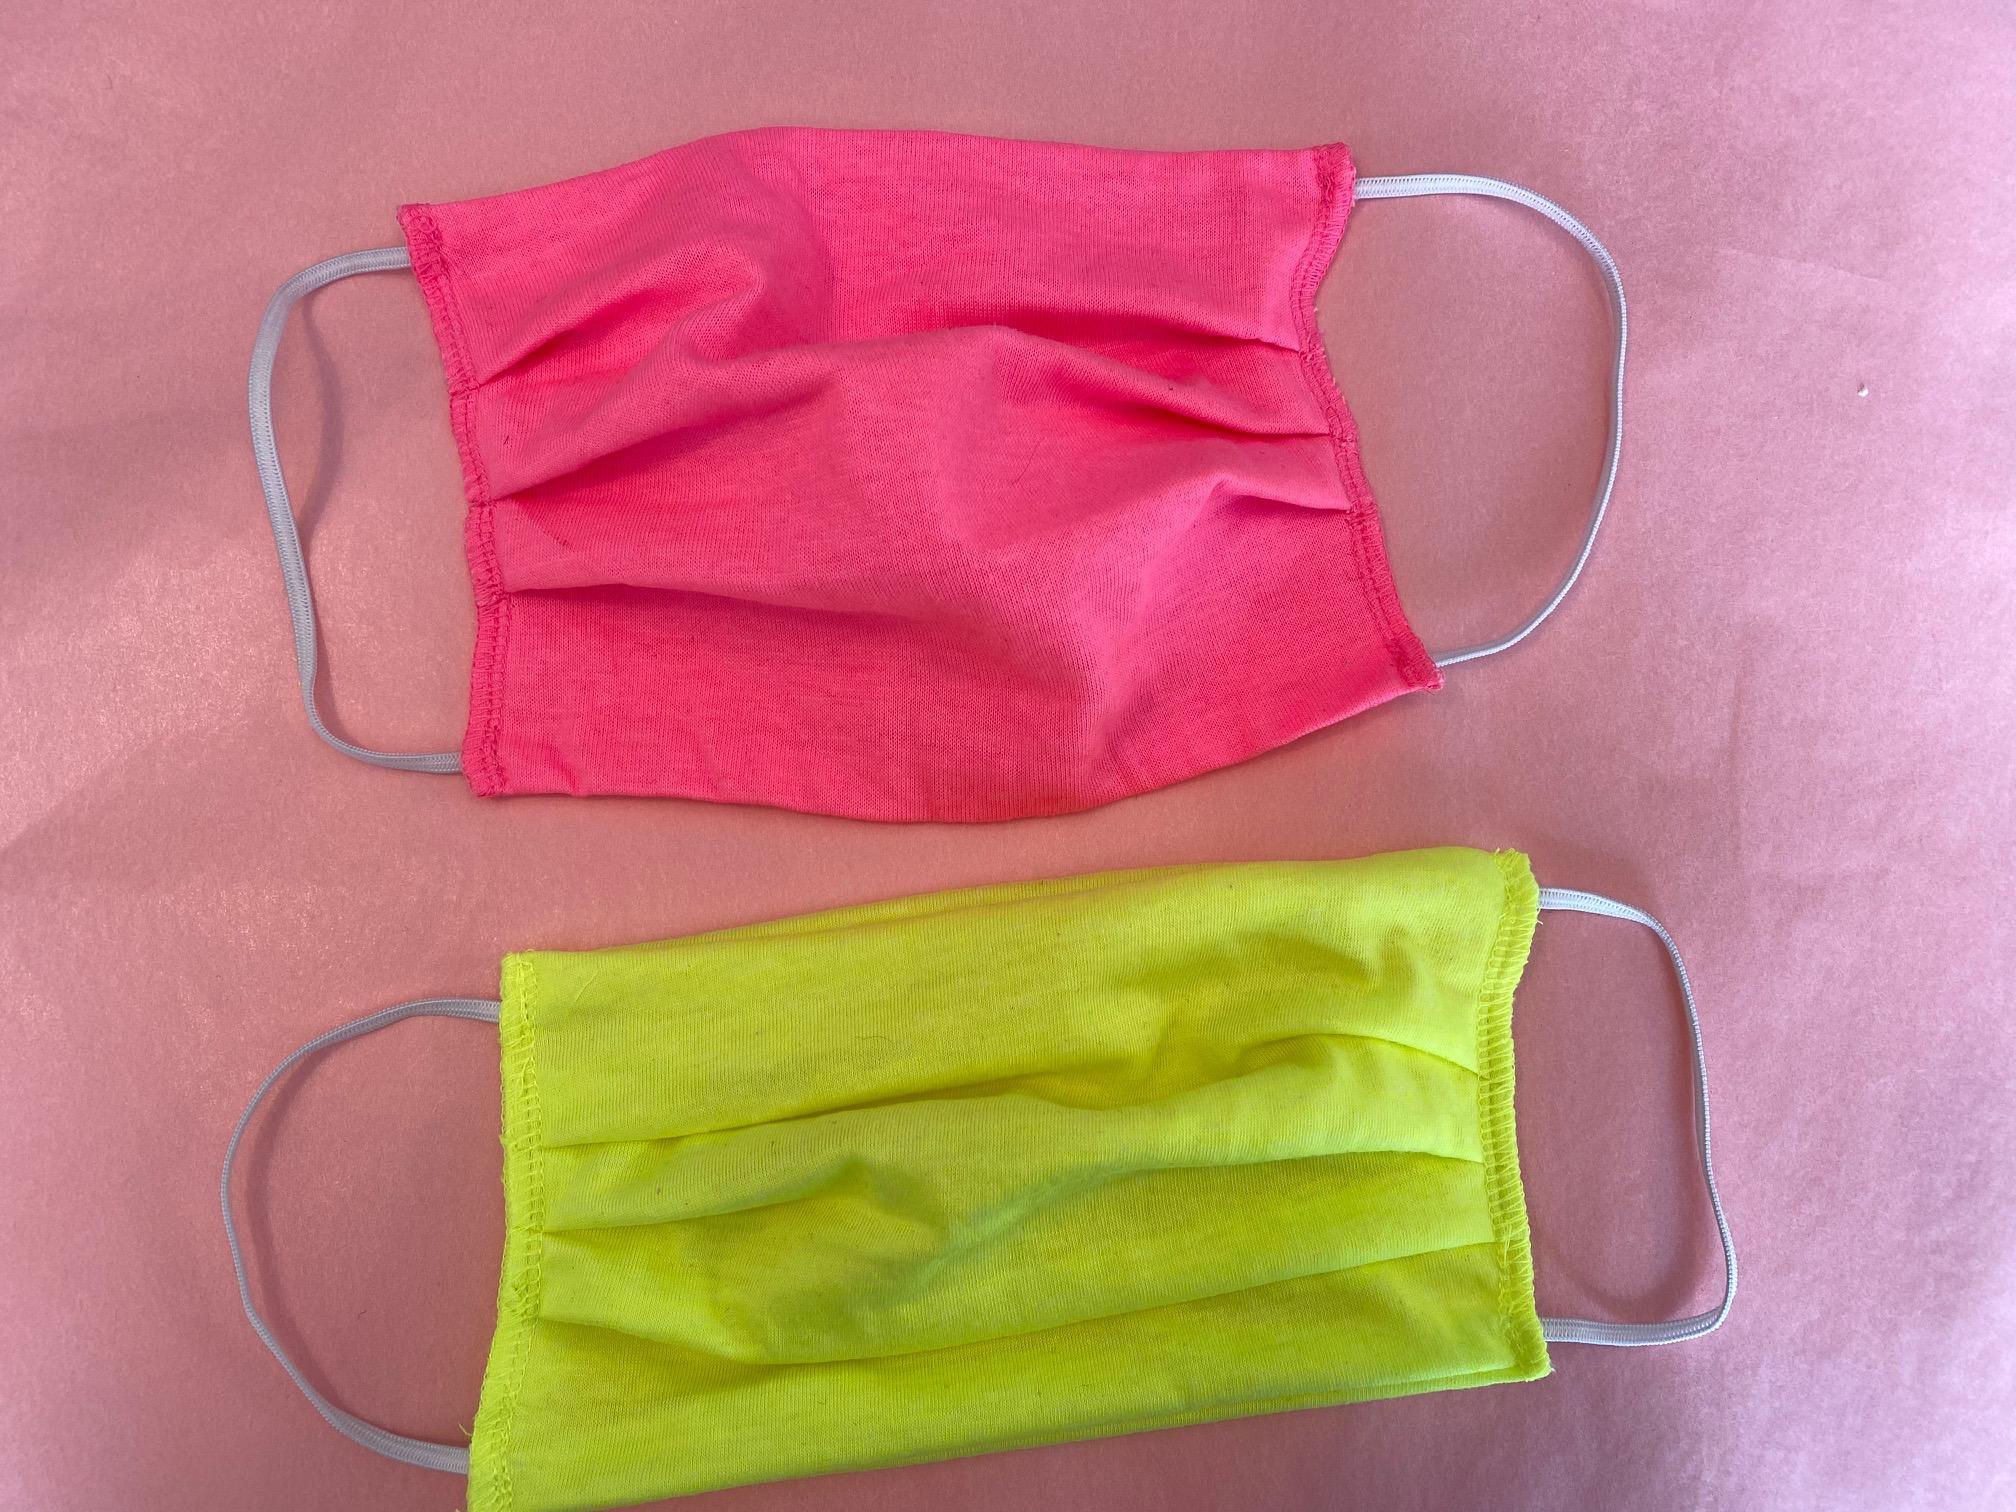 Neonfarbene Gesichtsmaske